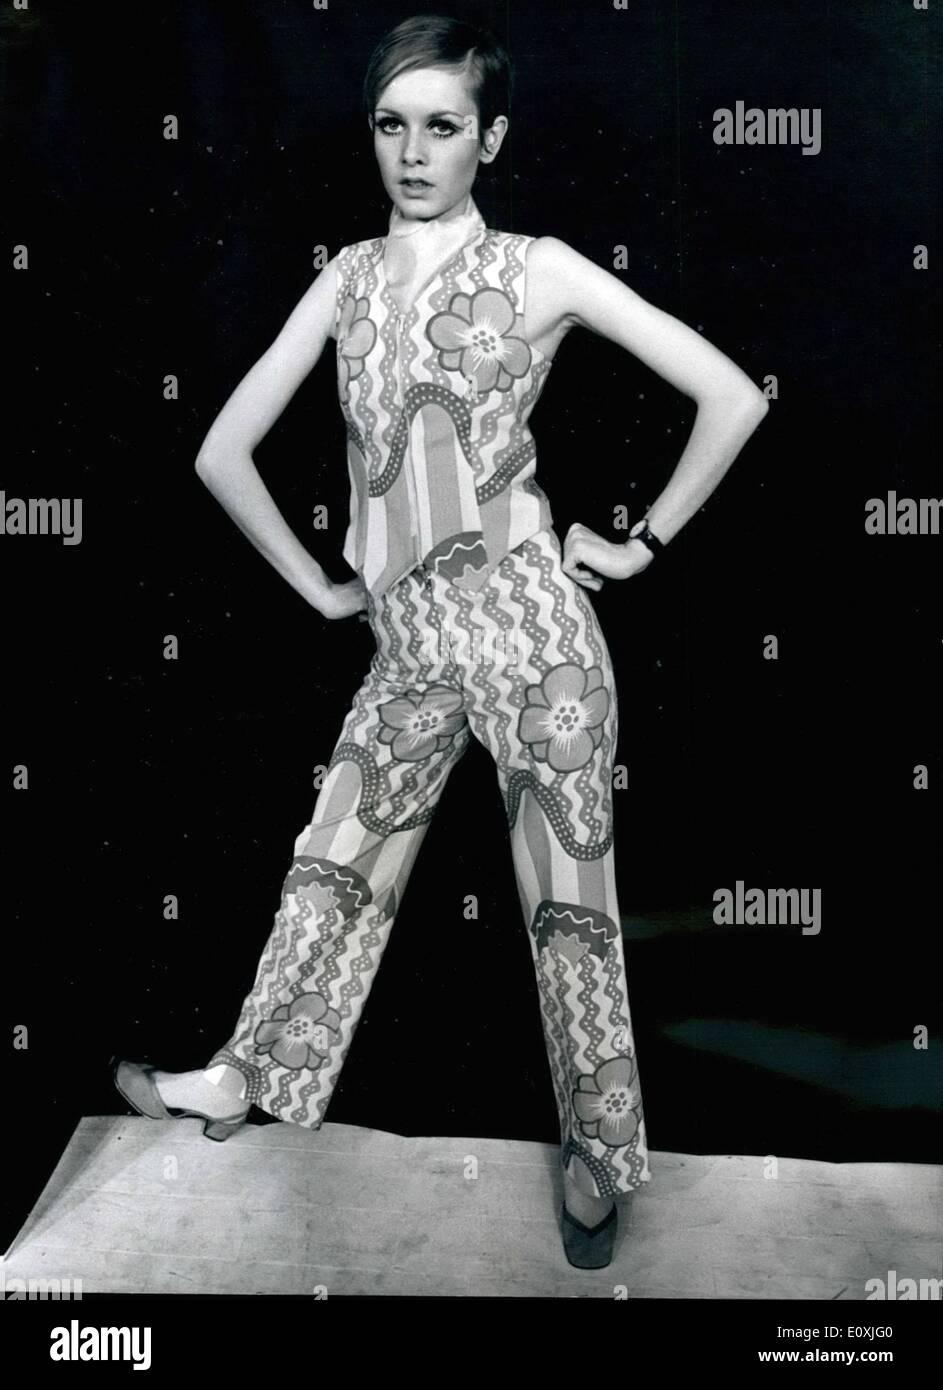 Feb 02 1967 And Now It S Twiggy The Fashion Chief Twiggy The Stock Photo Alamy